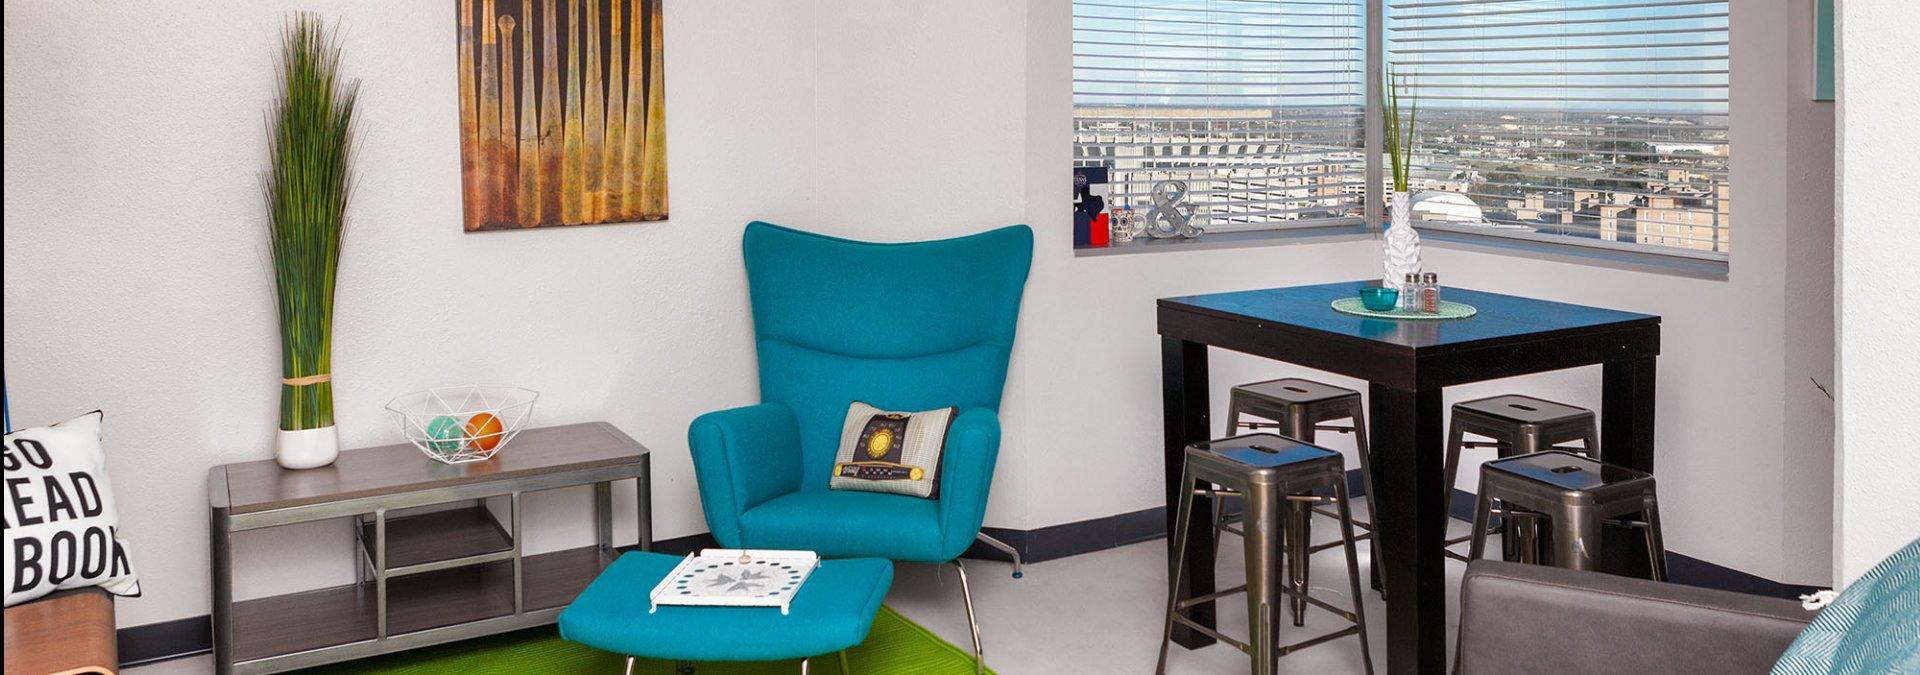 Spacious Floor Plans at Dobie Twenty21 Student Spaces